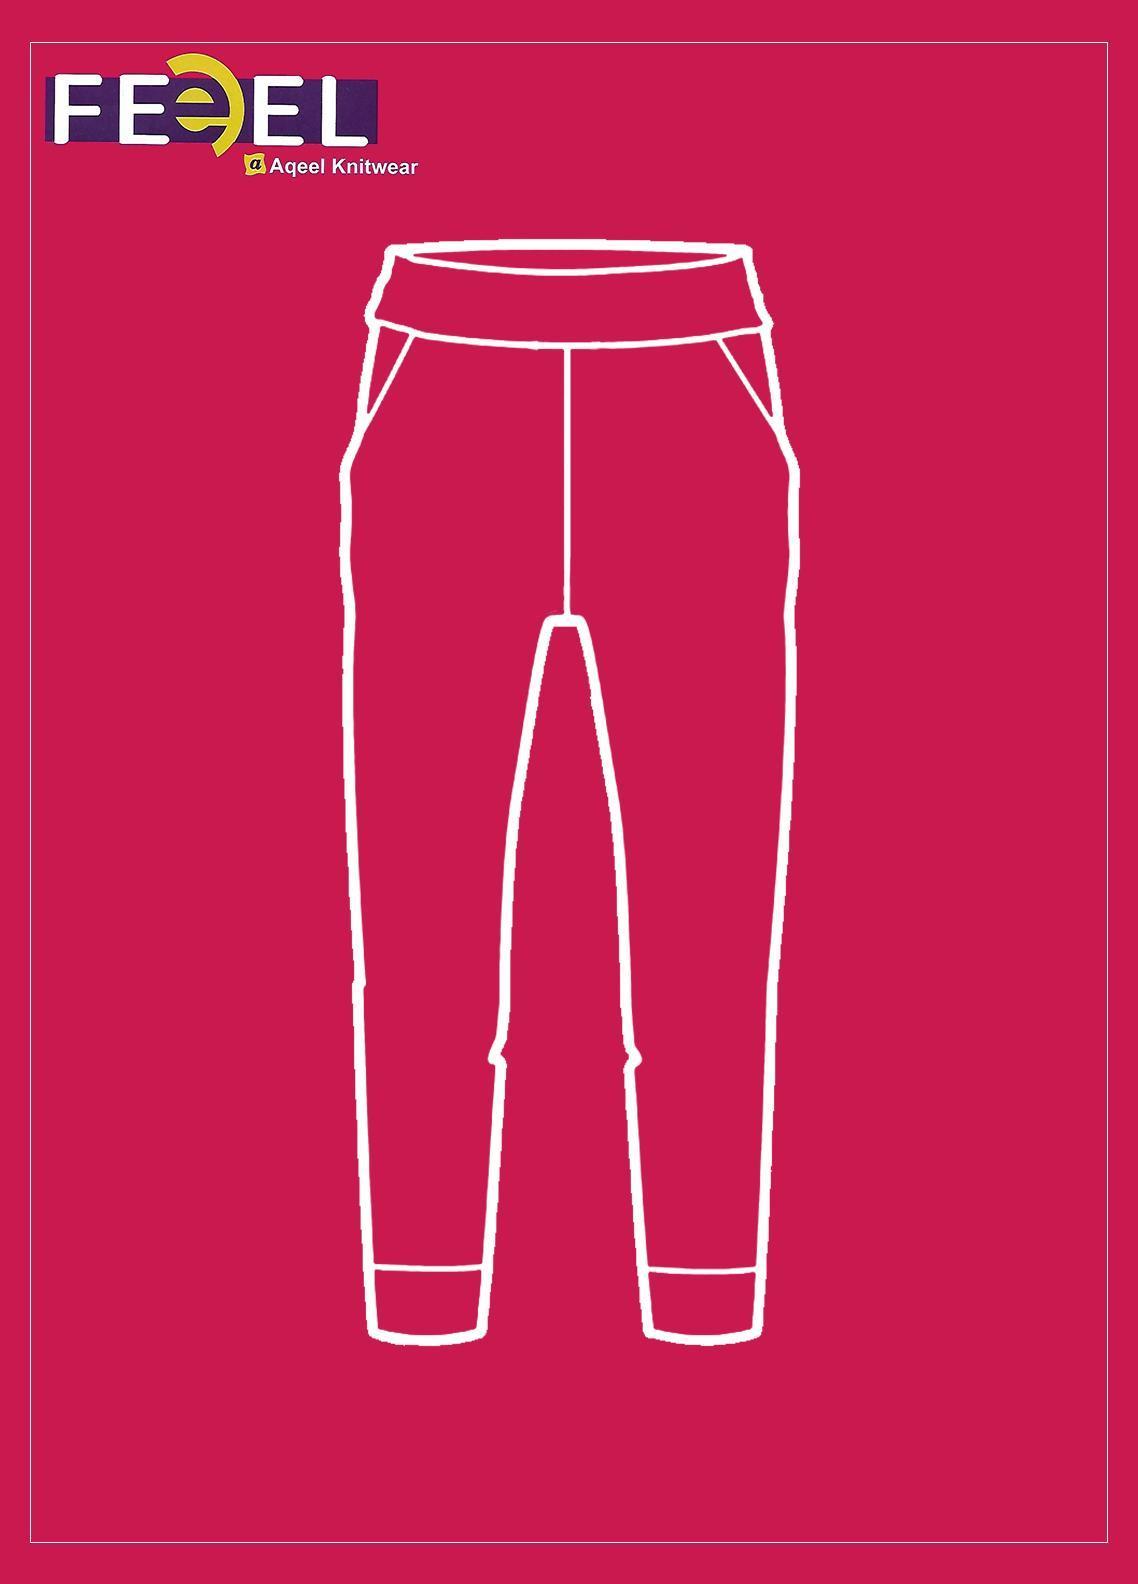 Feel Inner Wear Jersey Body Warmer Thermal 3 Fawn Color